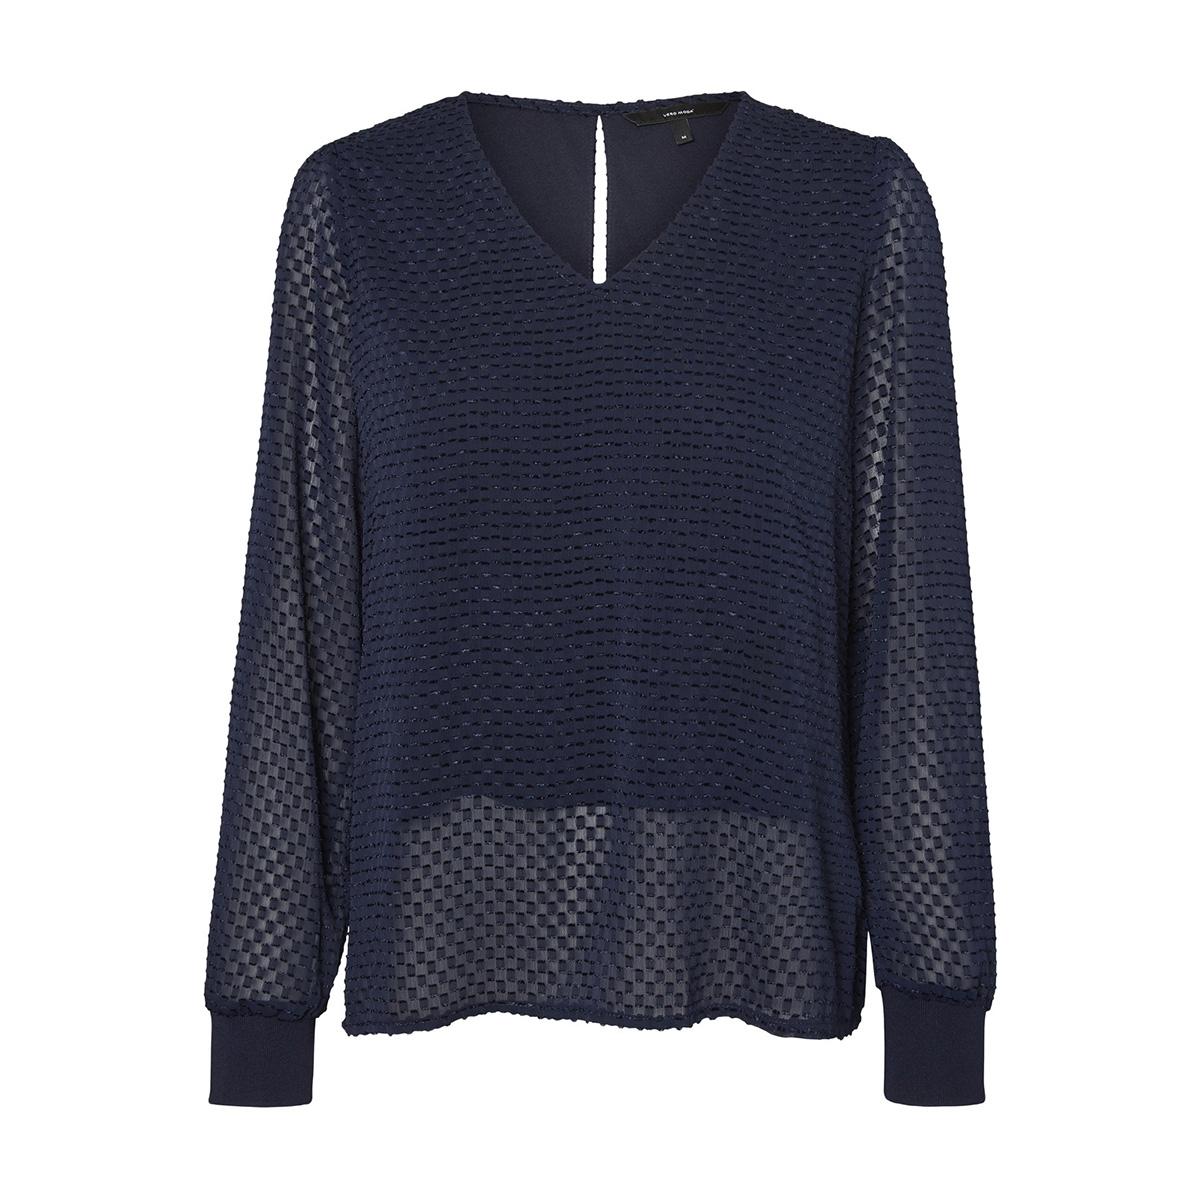 vmamelia ls  top wvn 10210329 vero moda t-shirt night sky